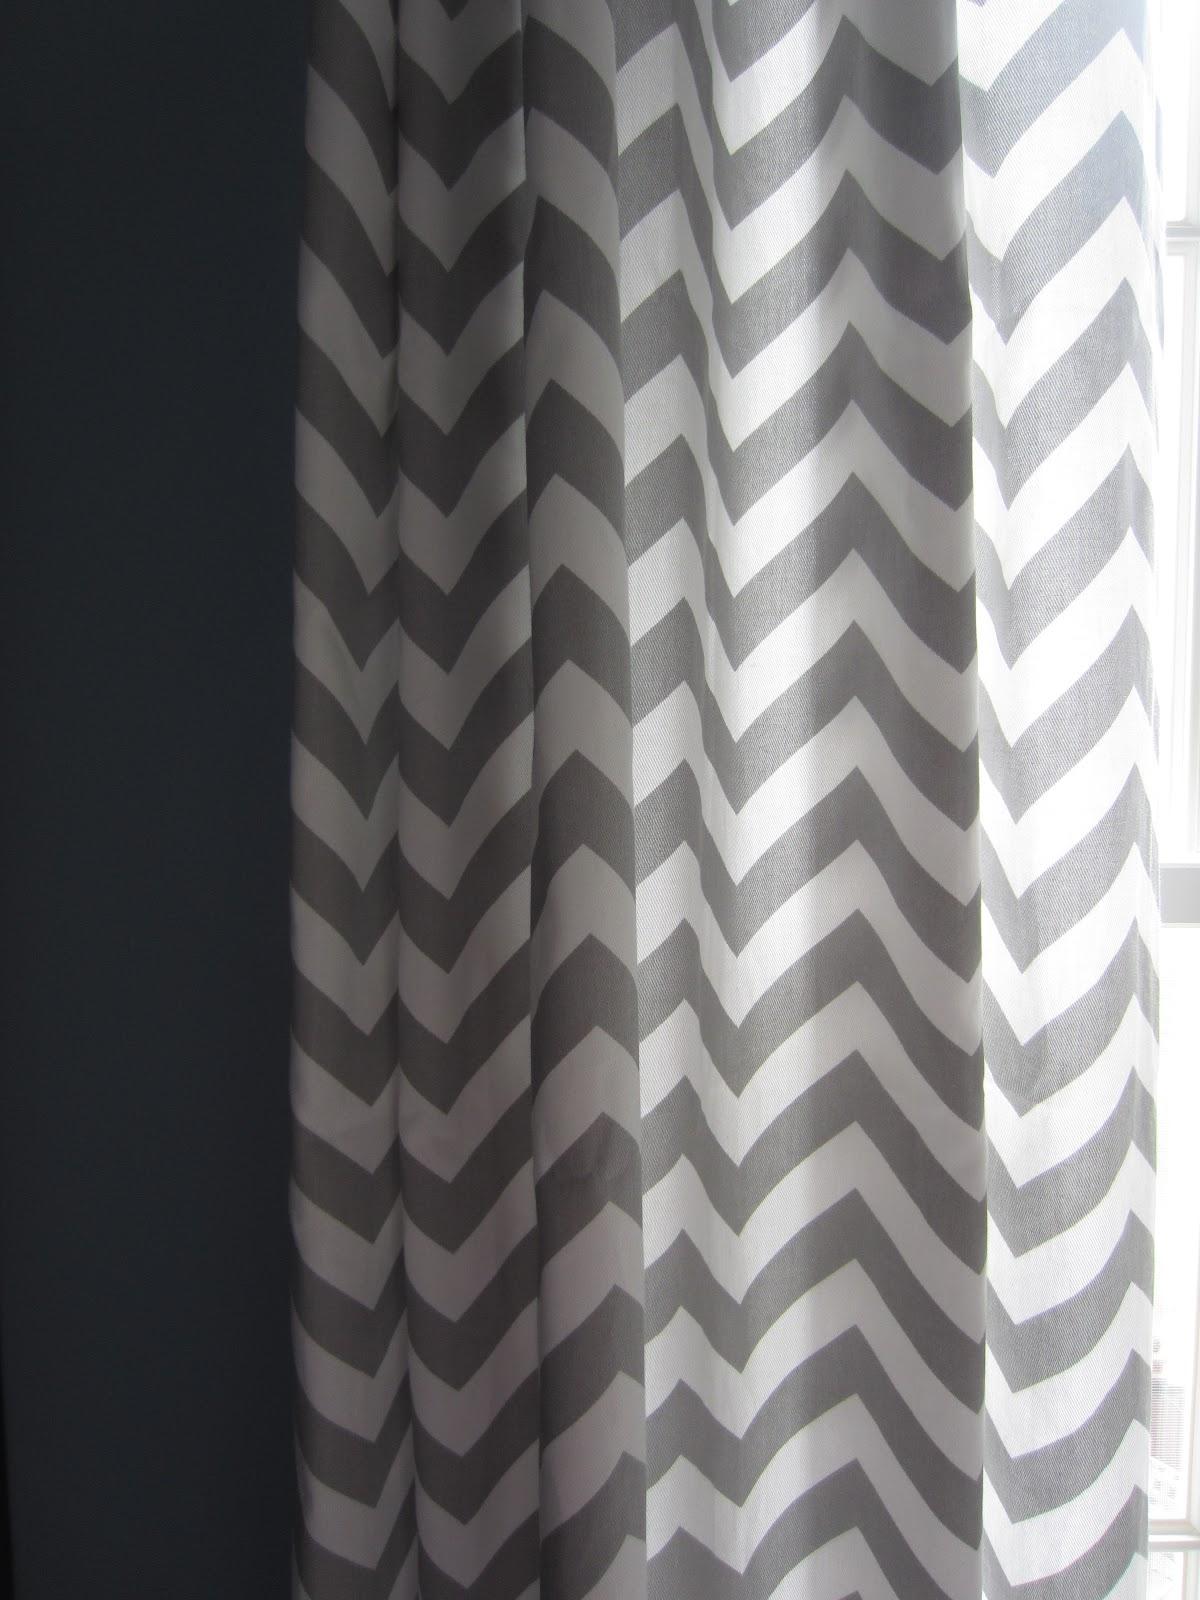 Black and white chevron curtain - Updated